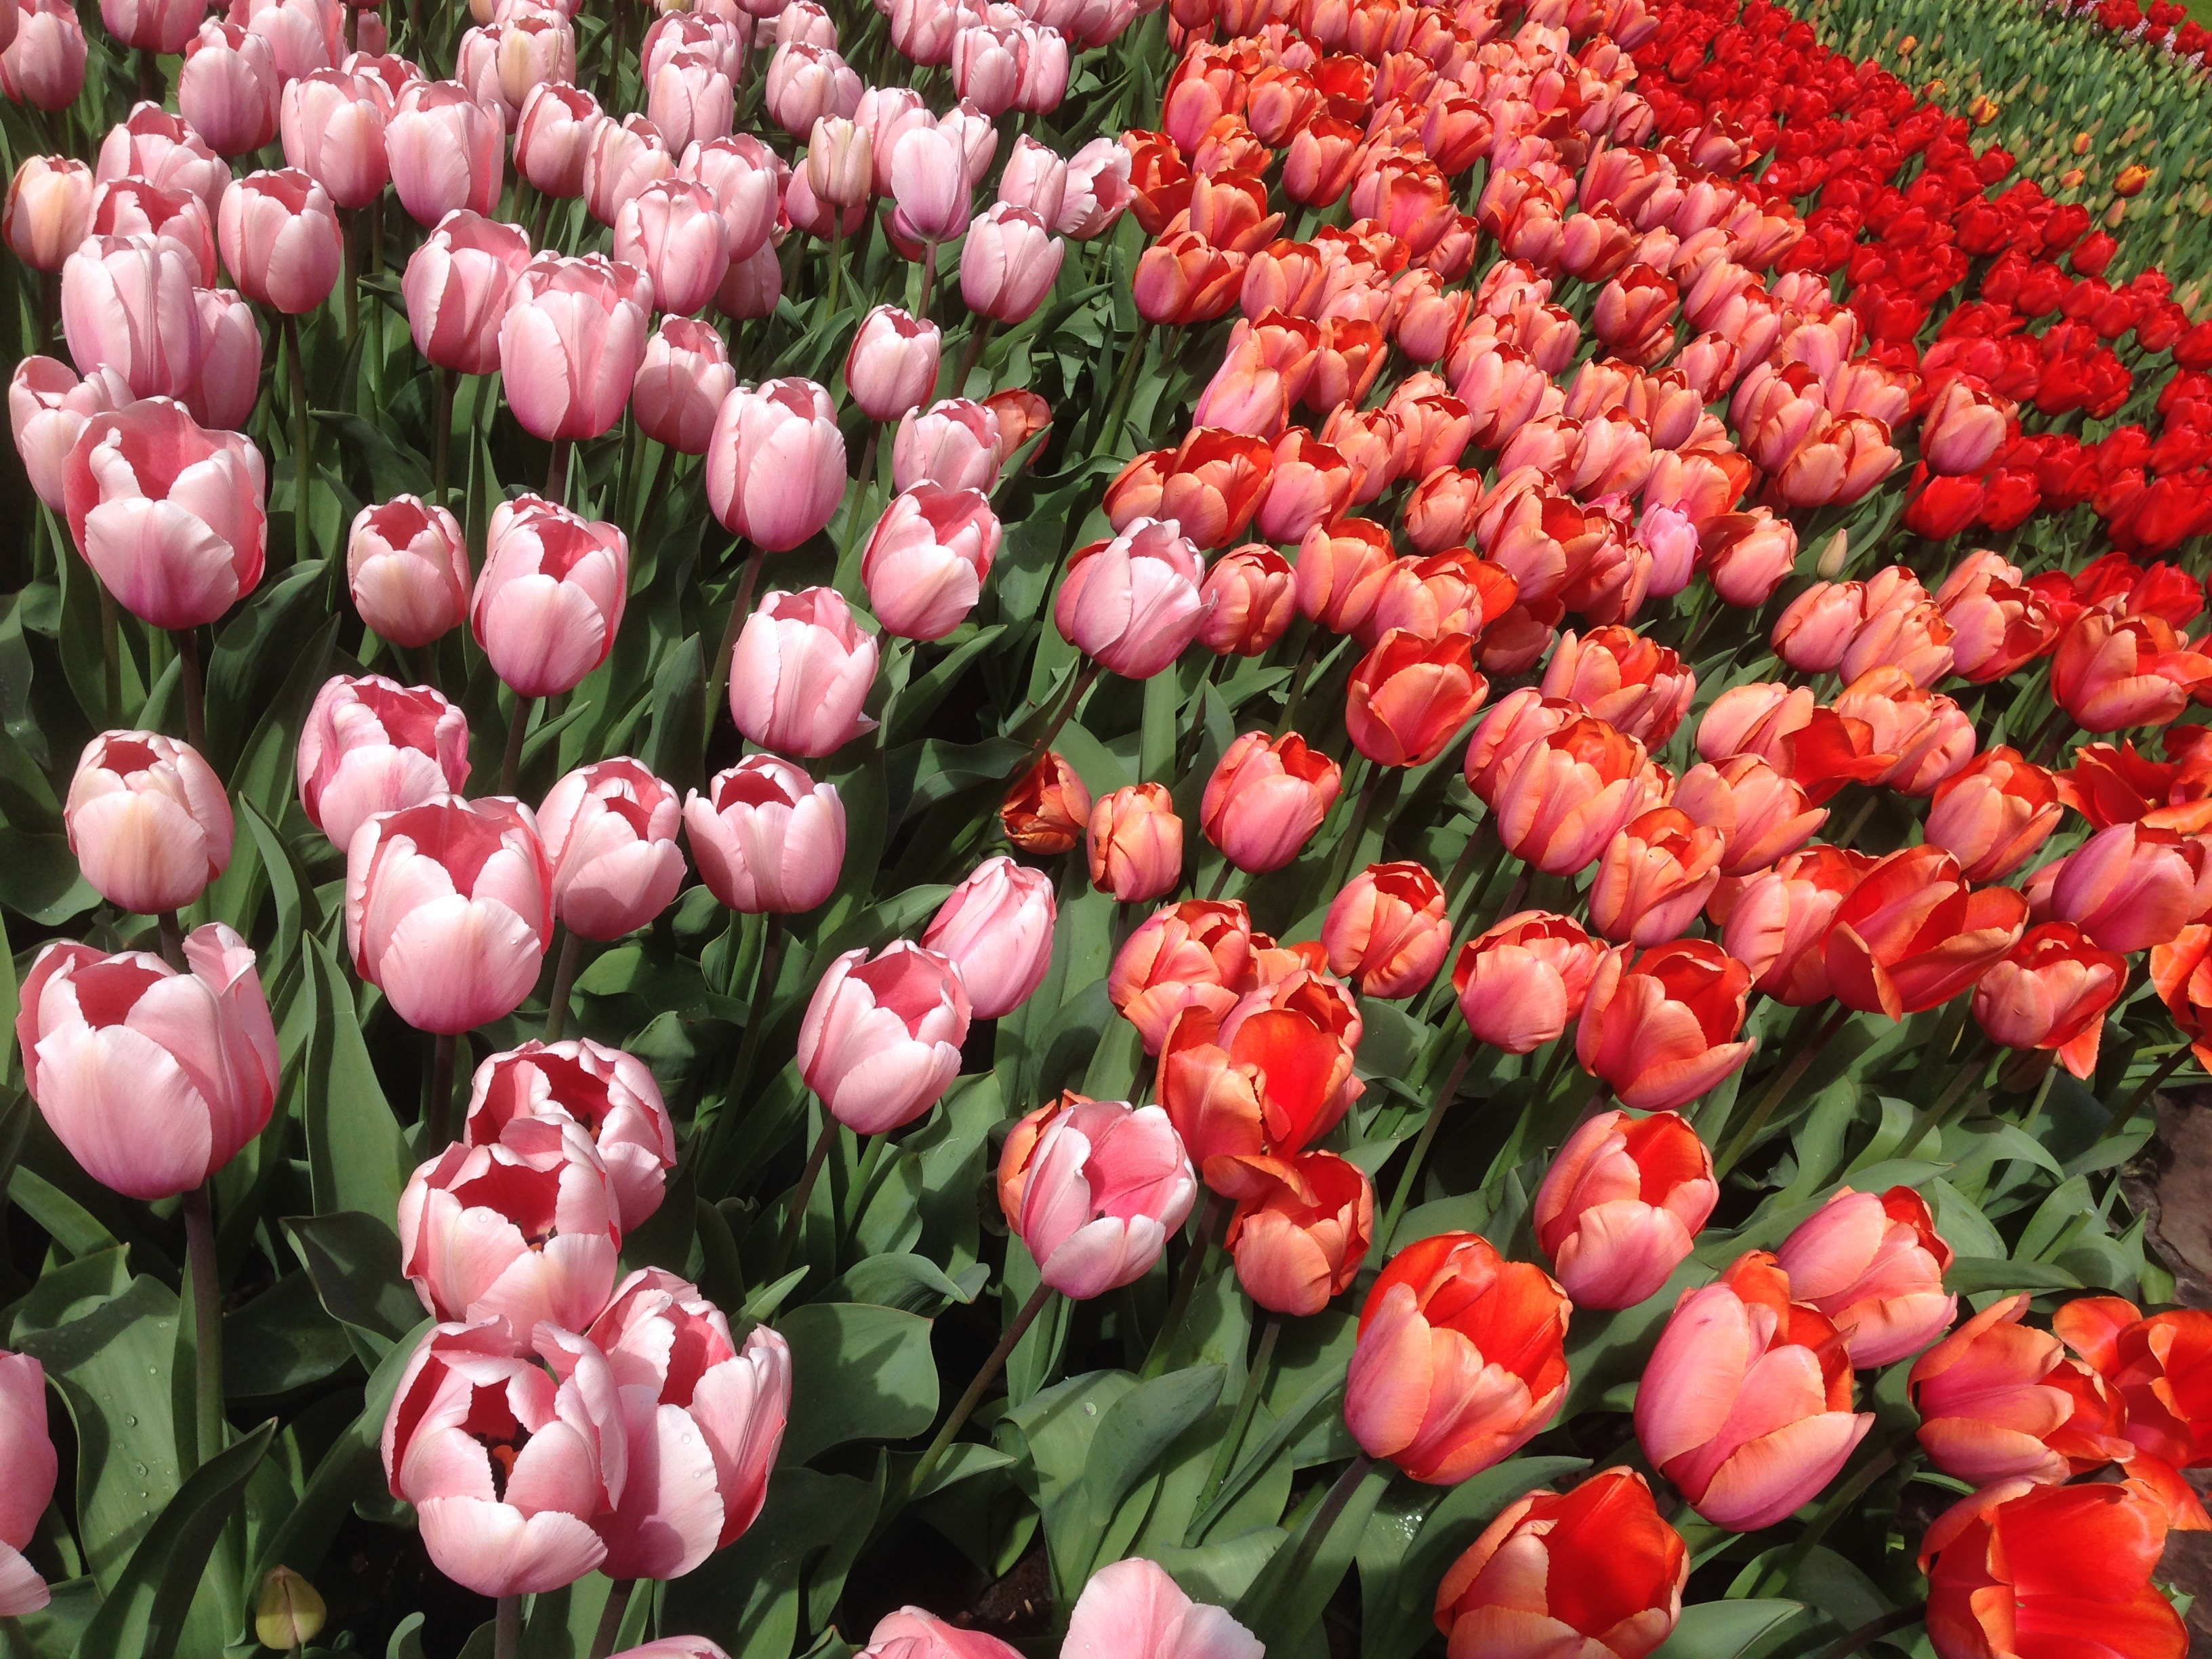 tulip gardens in holland